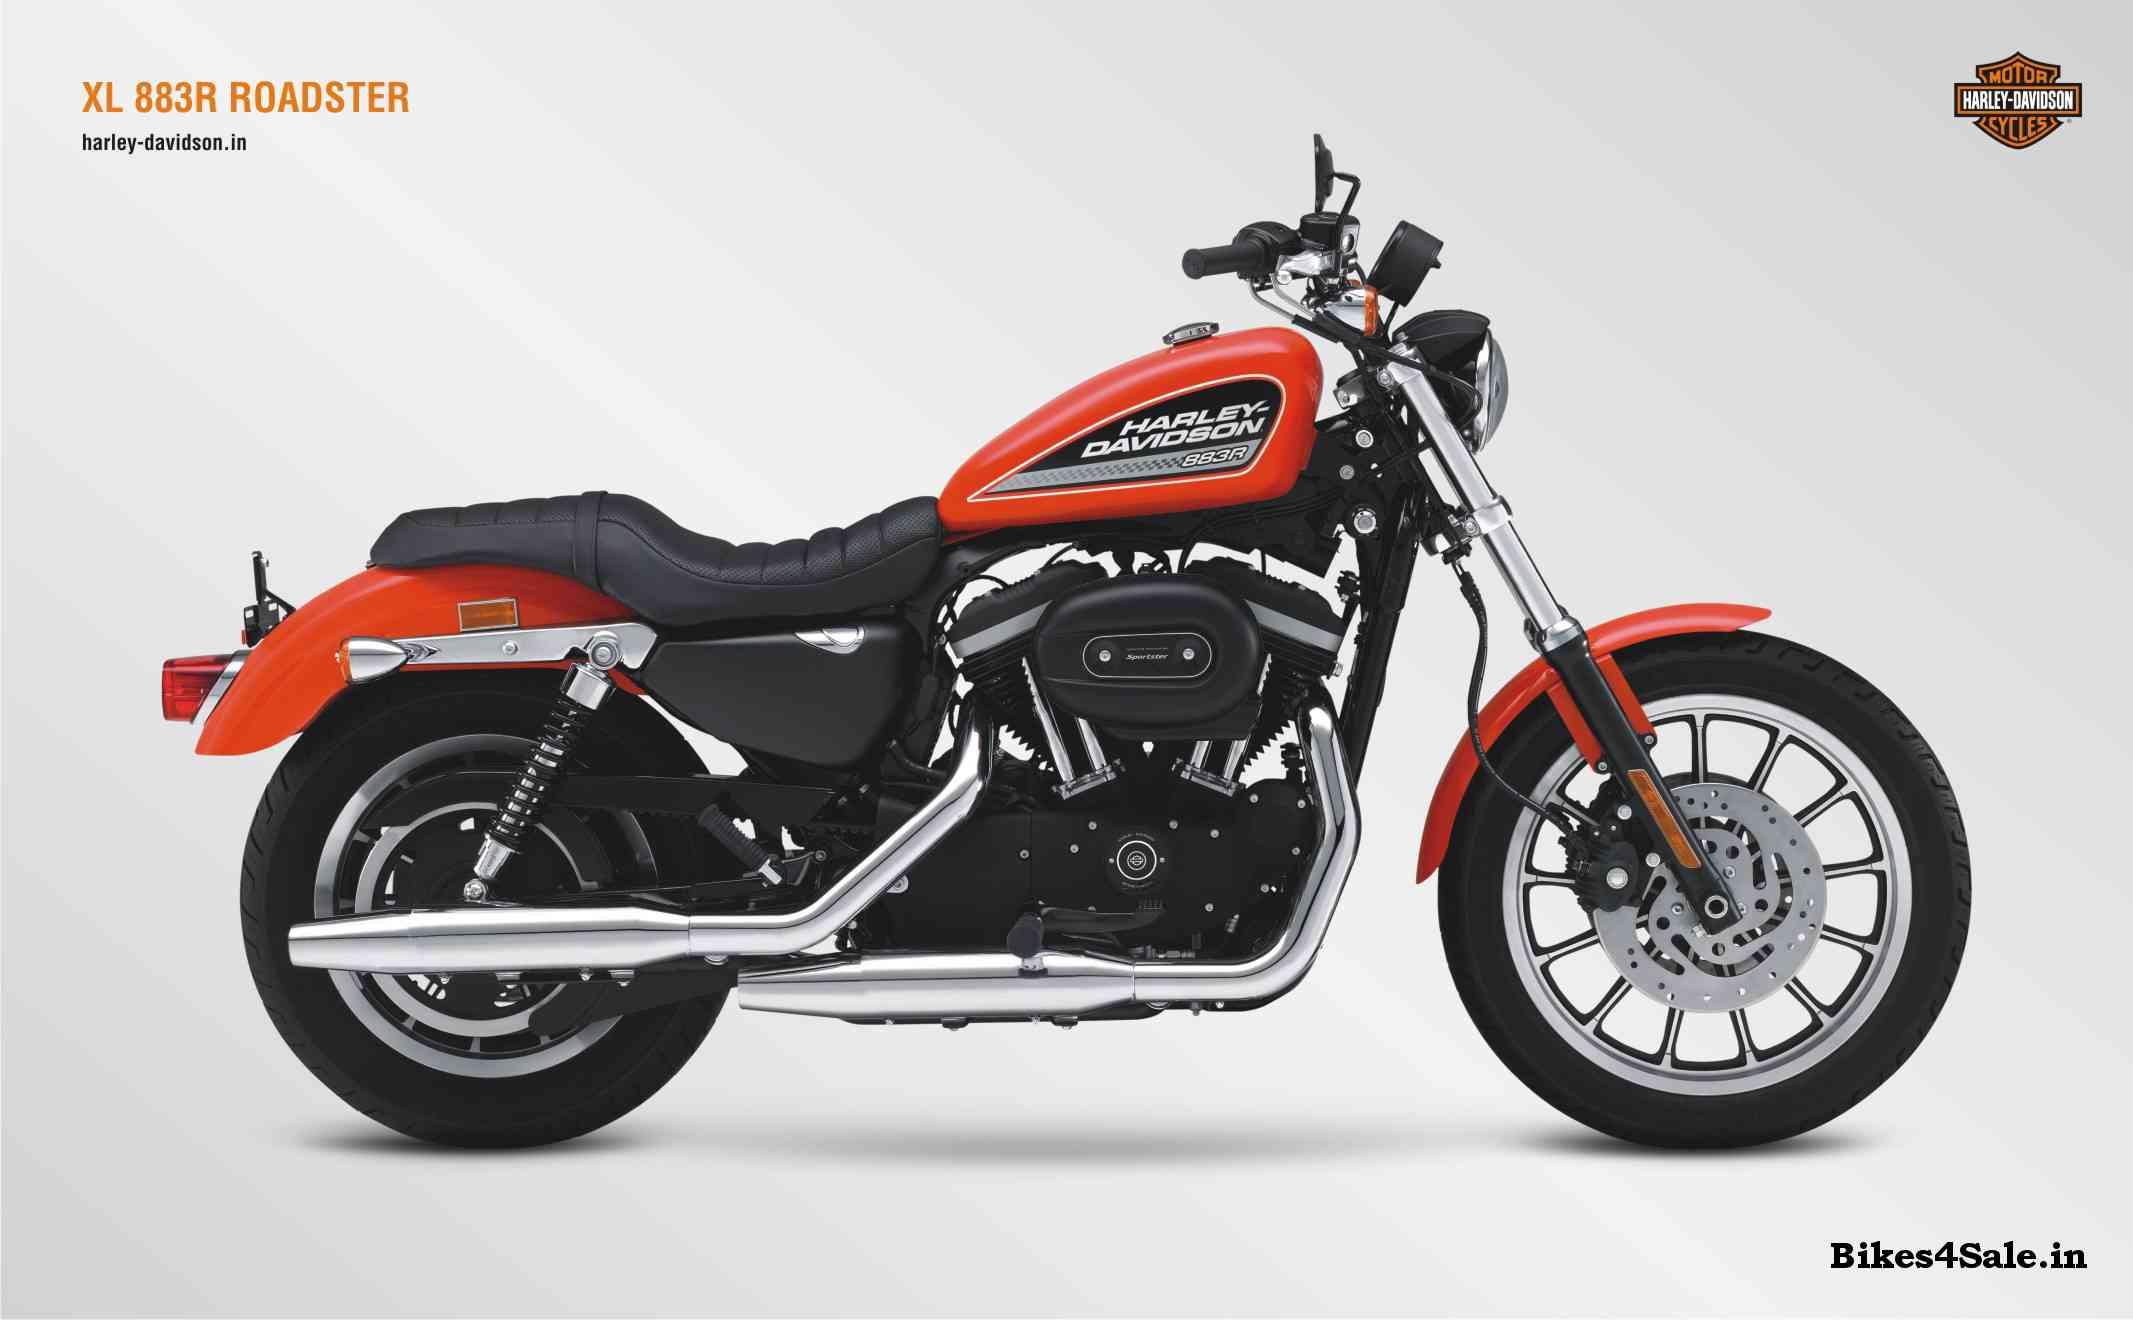 Harley Davidson XL 883R Roadster Photo